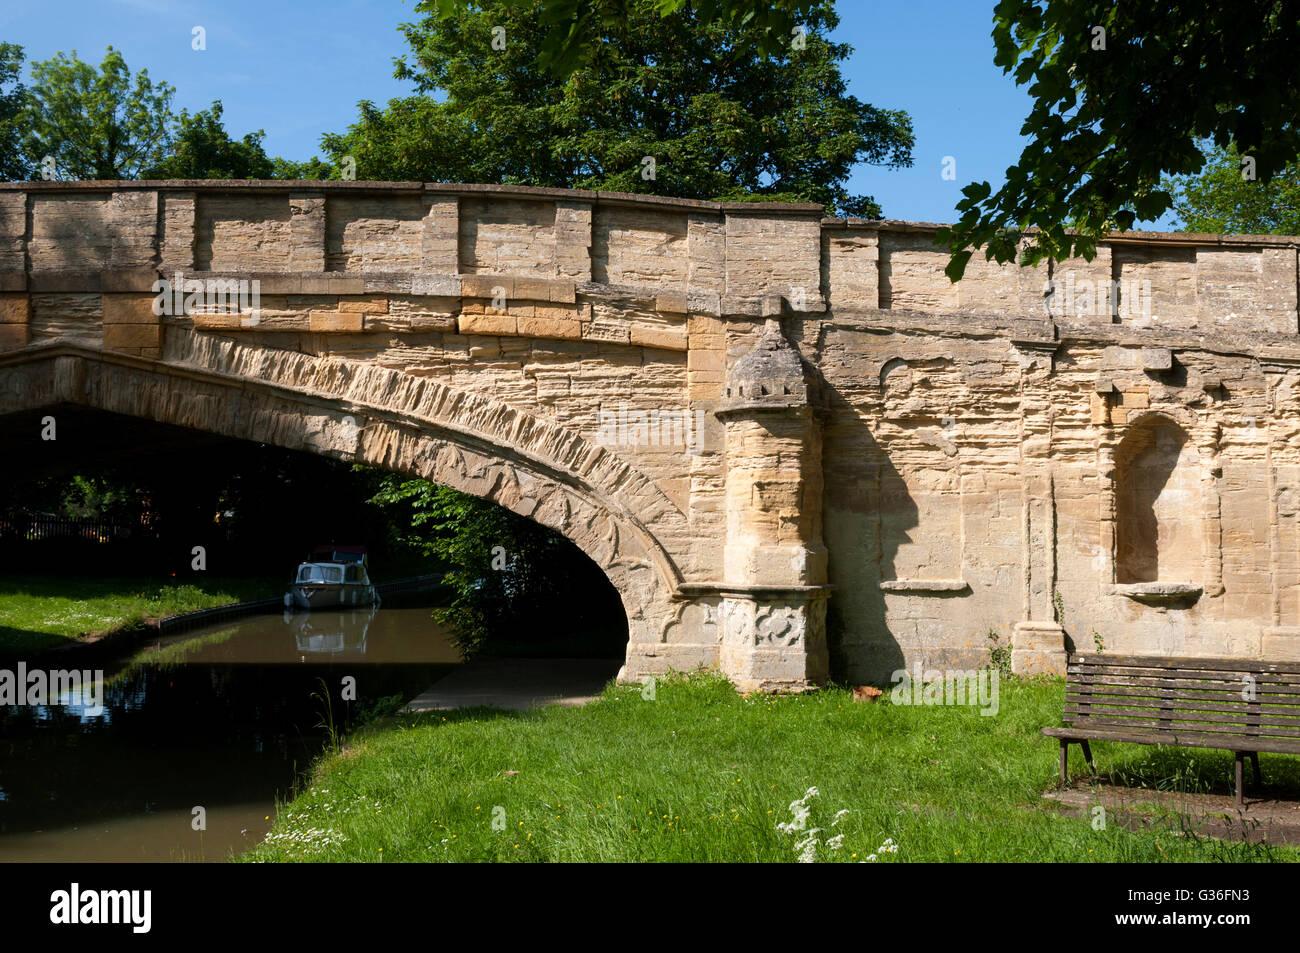 Solomon`s Bridge, Grand Union Canal, Cosgrove, Northamptonshire, England, UK - Stock Image